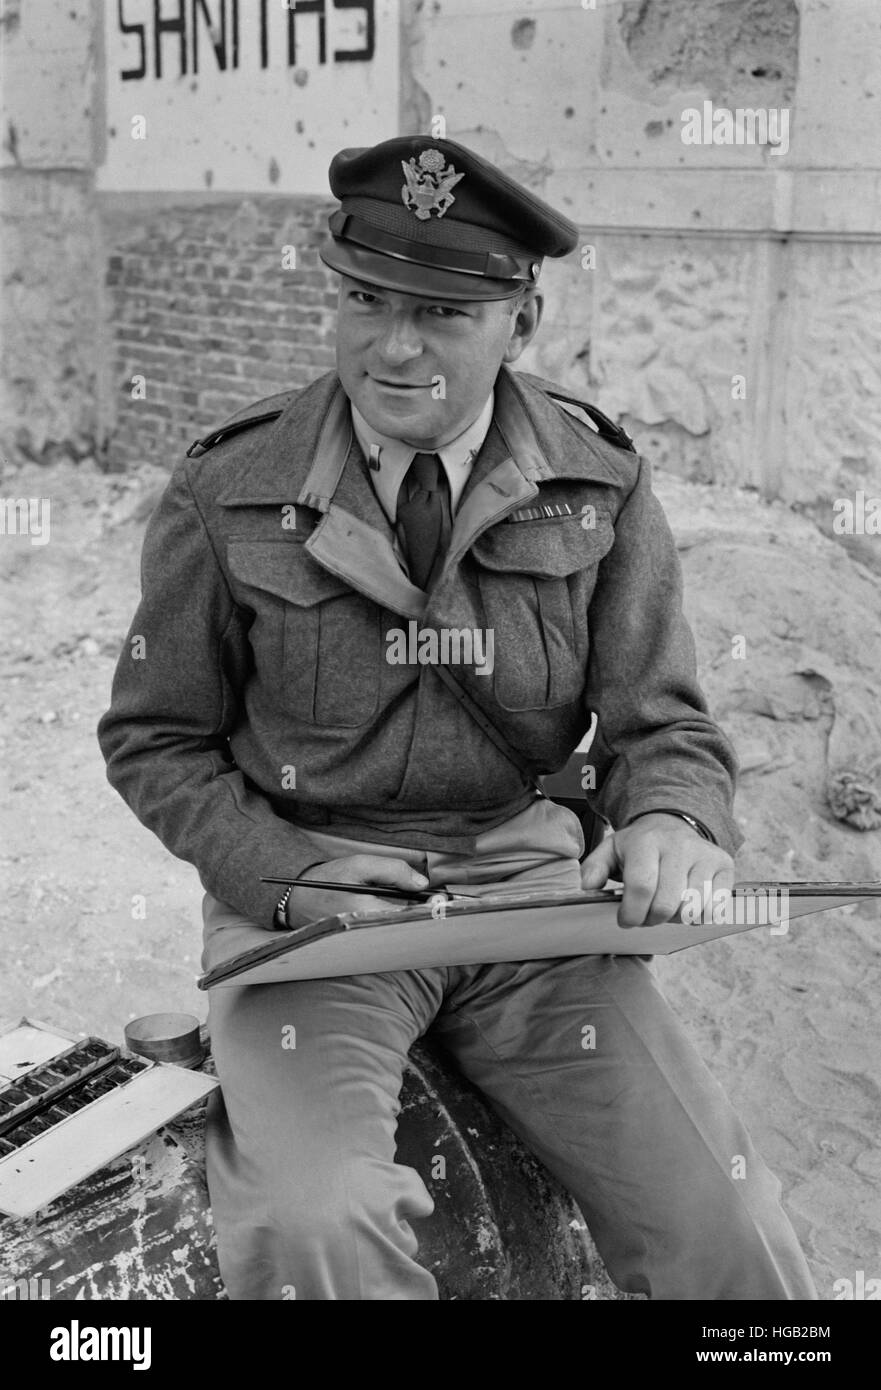 Lieutenant Milton Marx painting in the street, 1943. - Stock Image